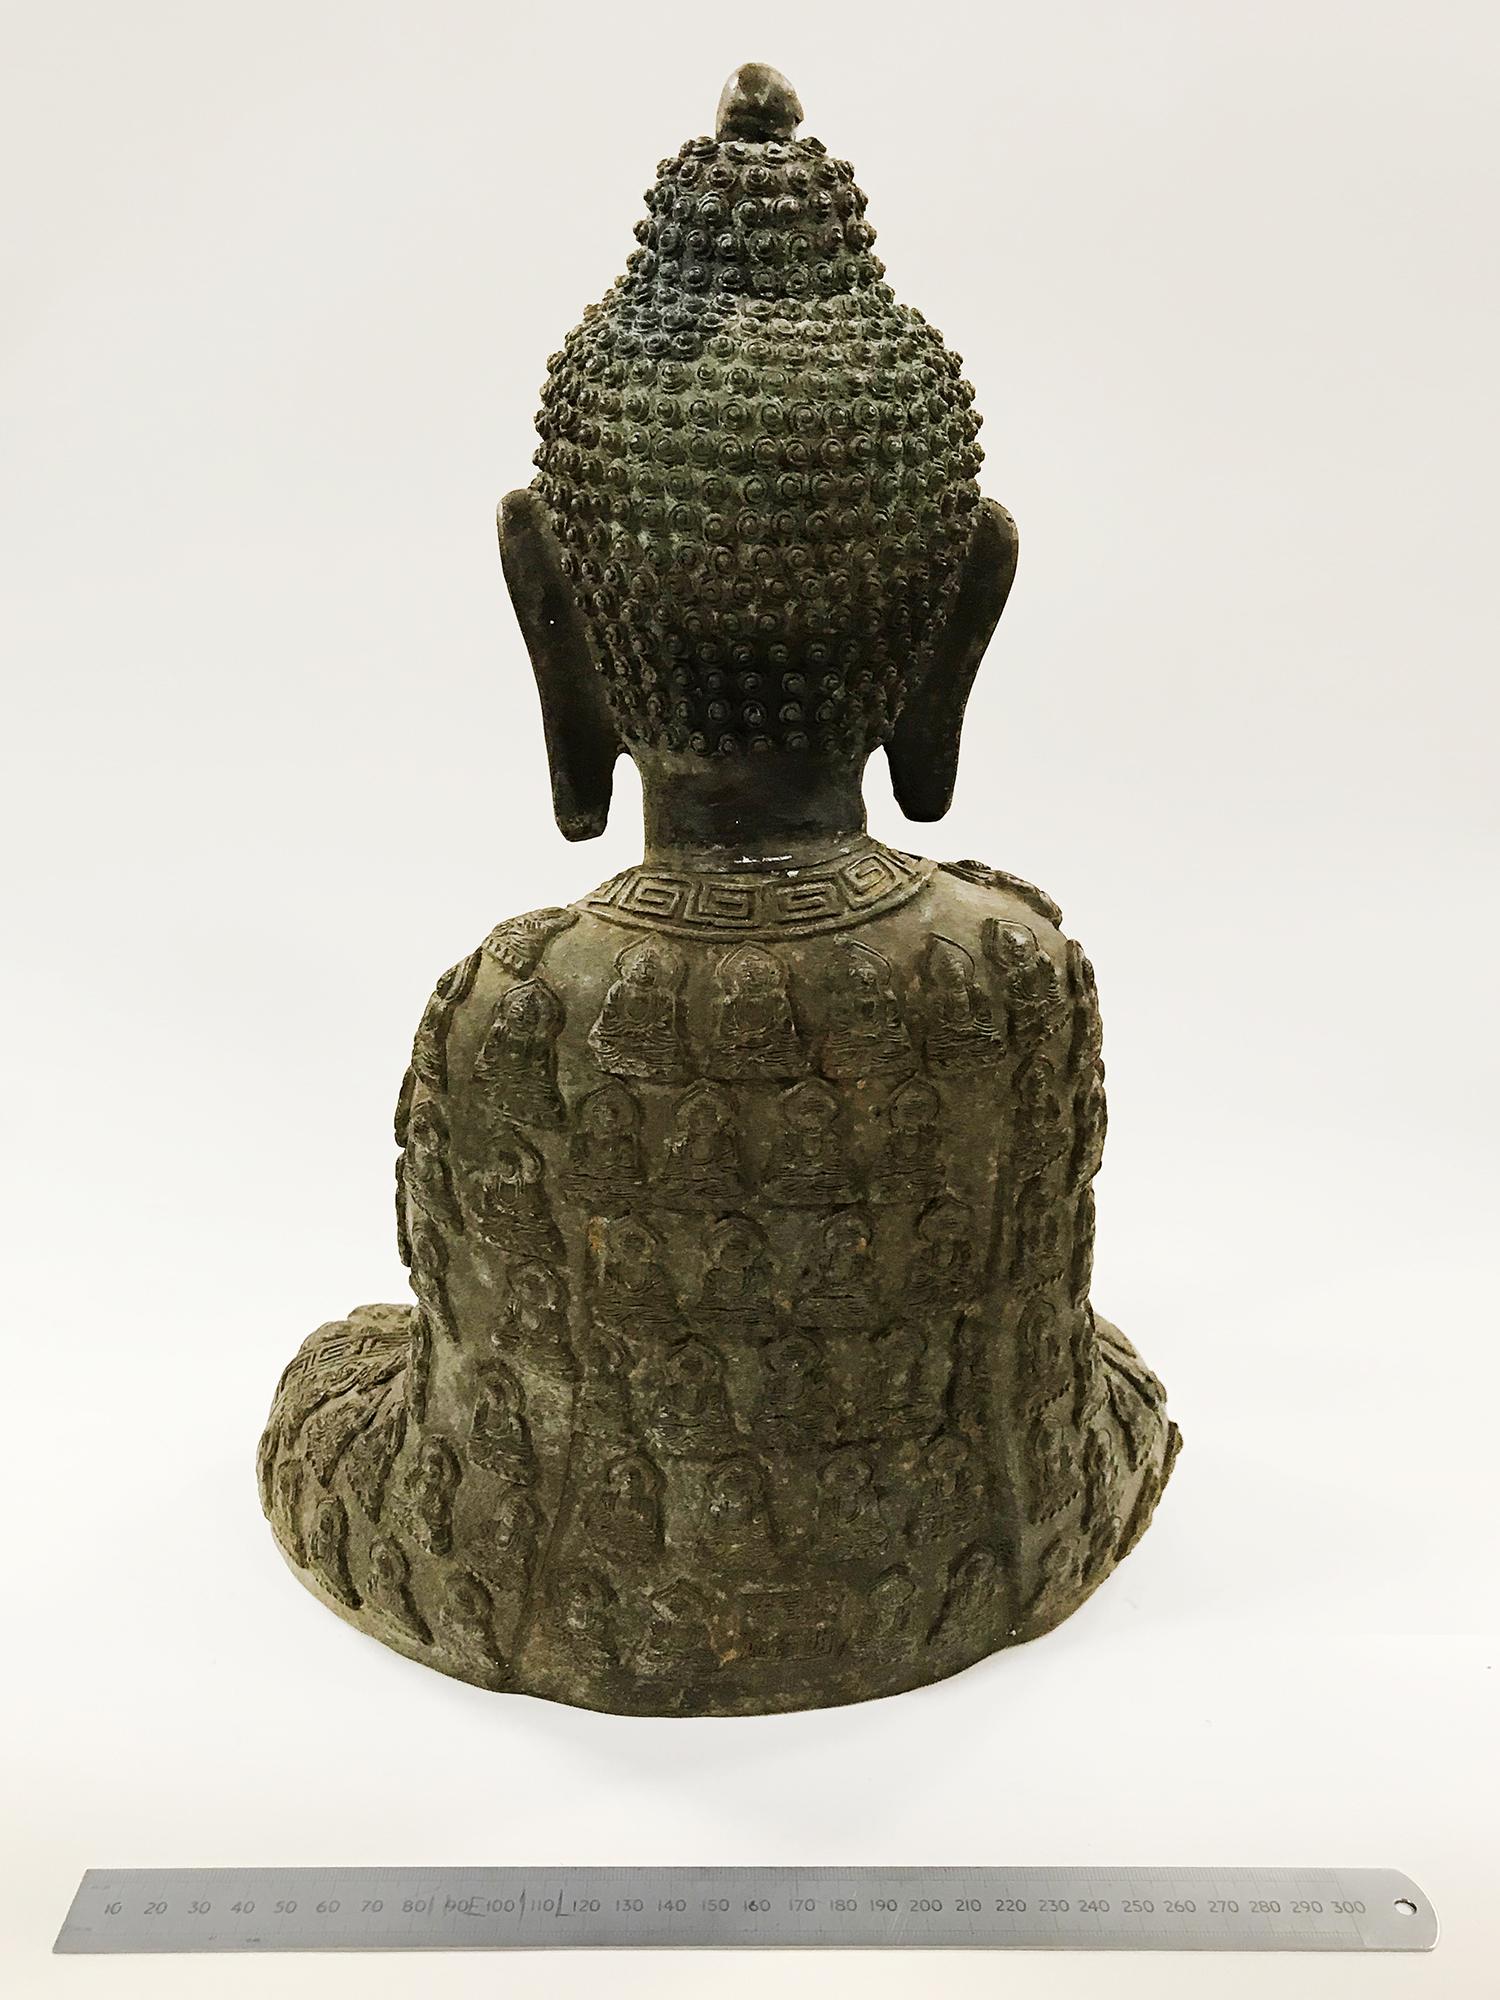 LARGE BRONZE SEATED BUDDHIST FIGURE - 40CM HIGH - Image 2 of 2